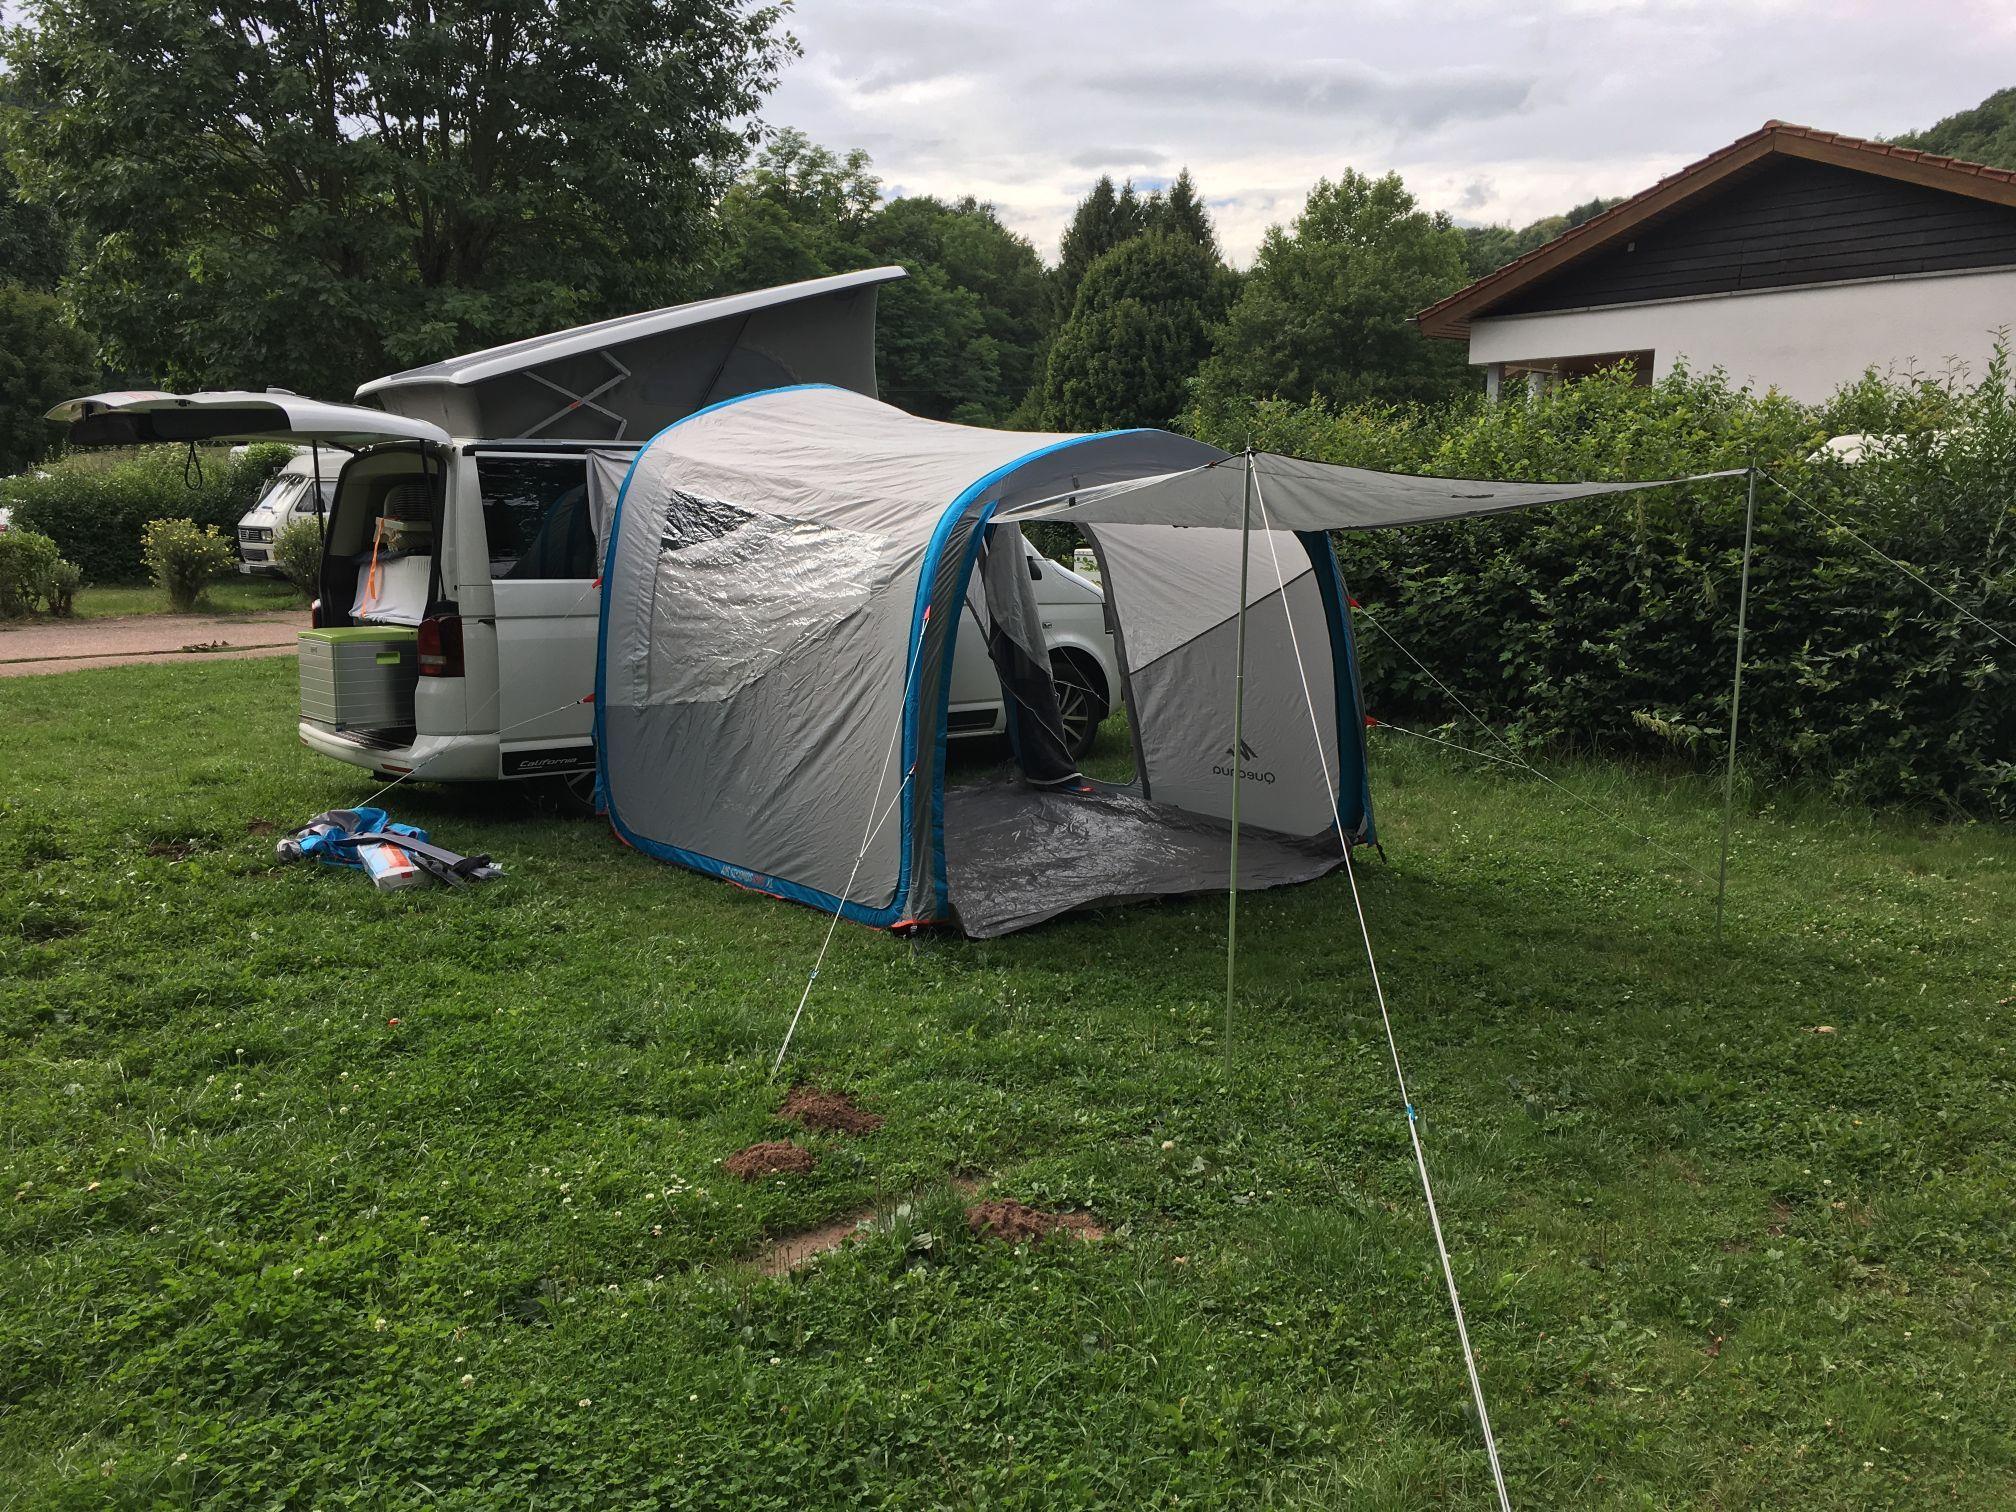 vw t5 vorzelt luft pumpe airbase quechua camper van img 4485 vorzelt vorzelt wohnmobil und. Black Bedroom Furniture Sets. Home Design Ideas